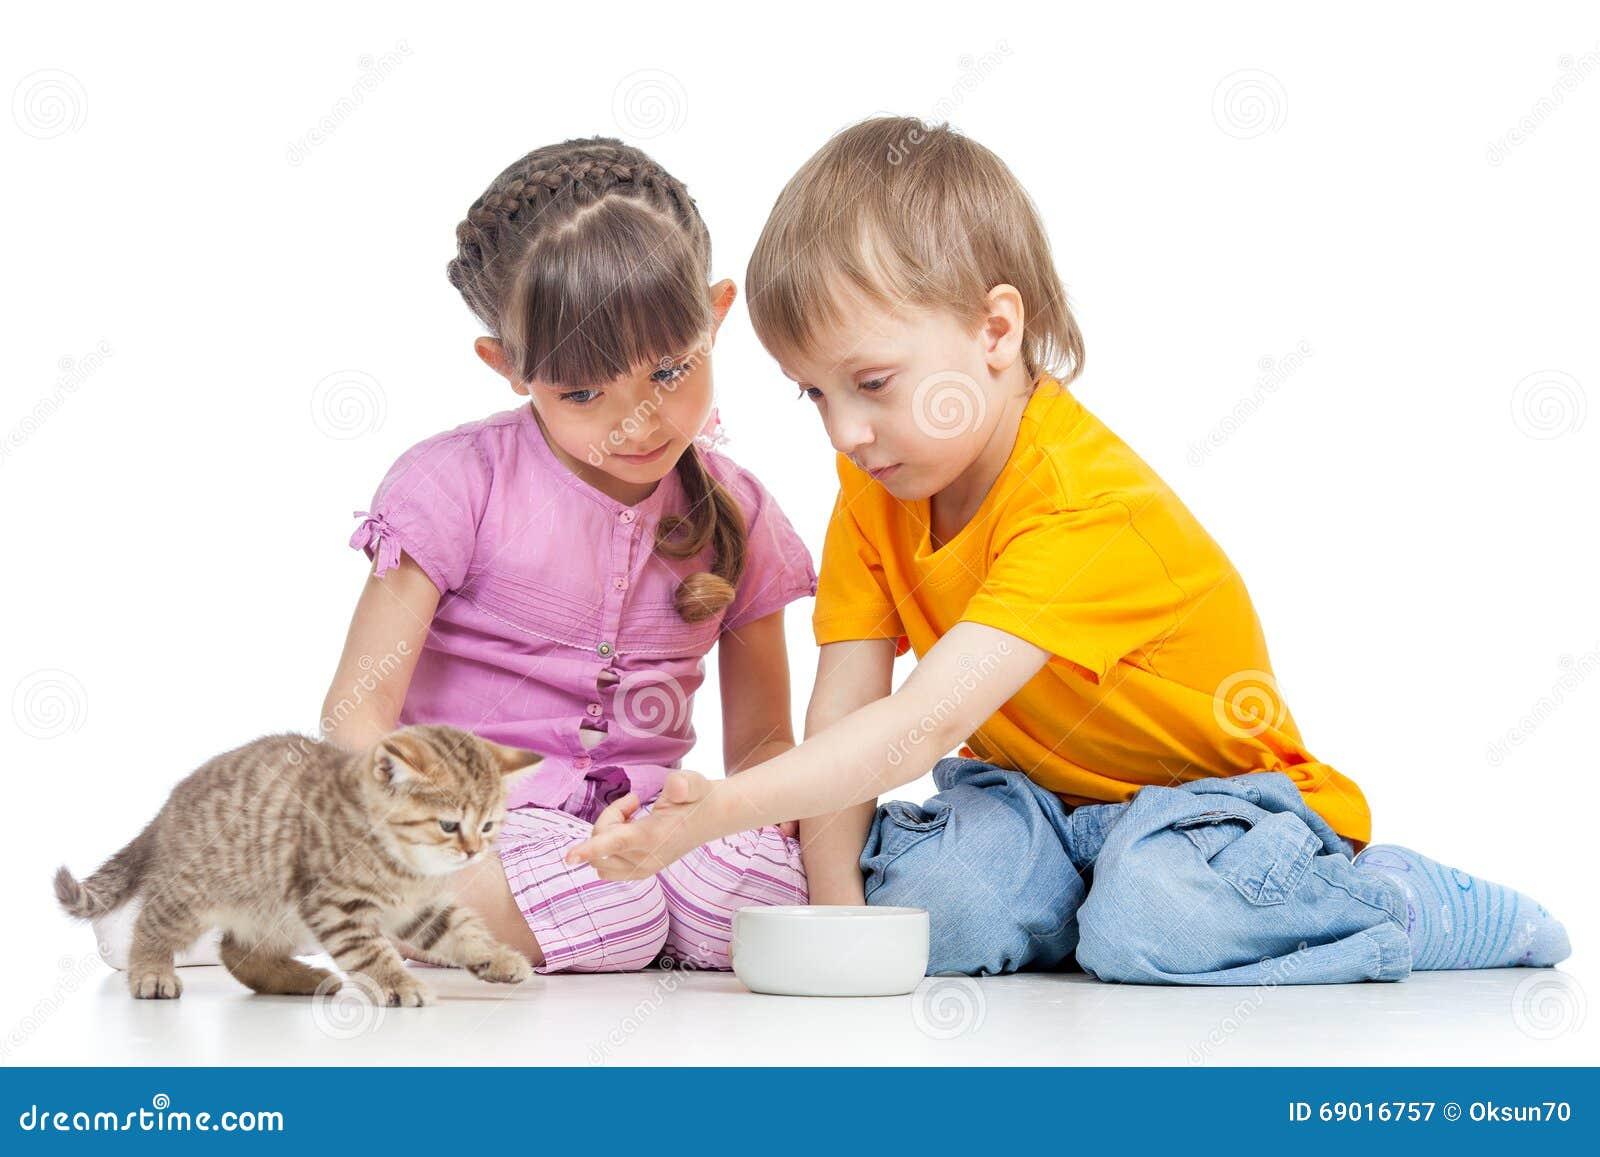 Boy Feeding Cat S